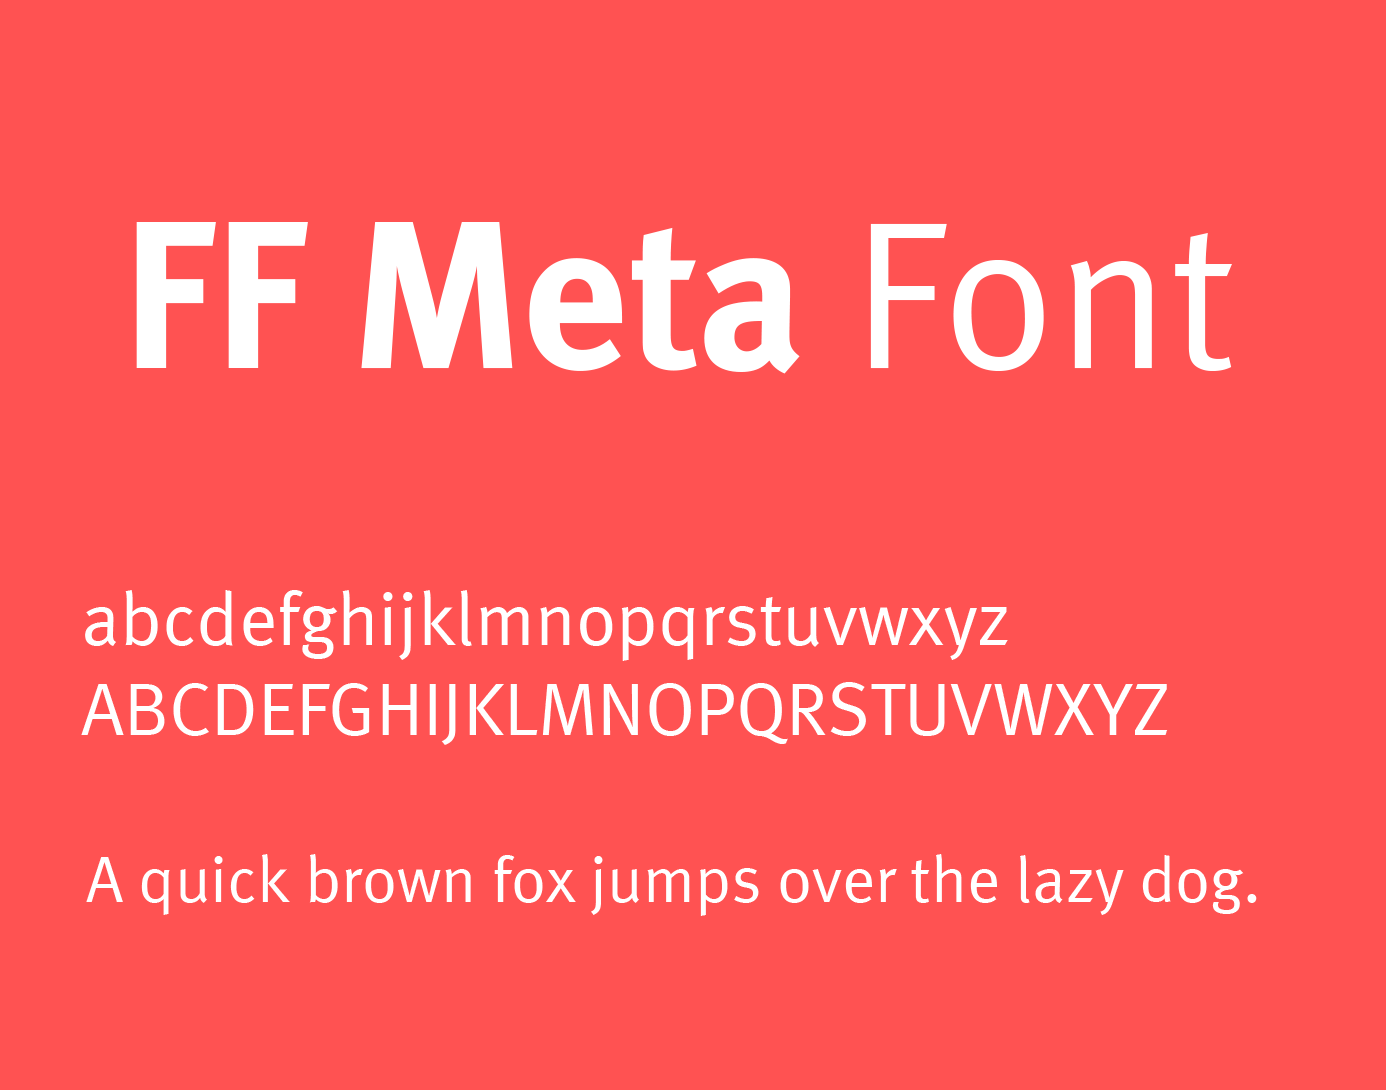 ff-meta-font